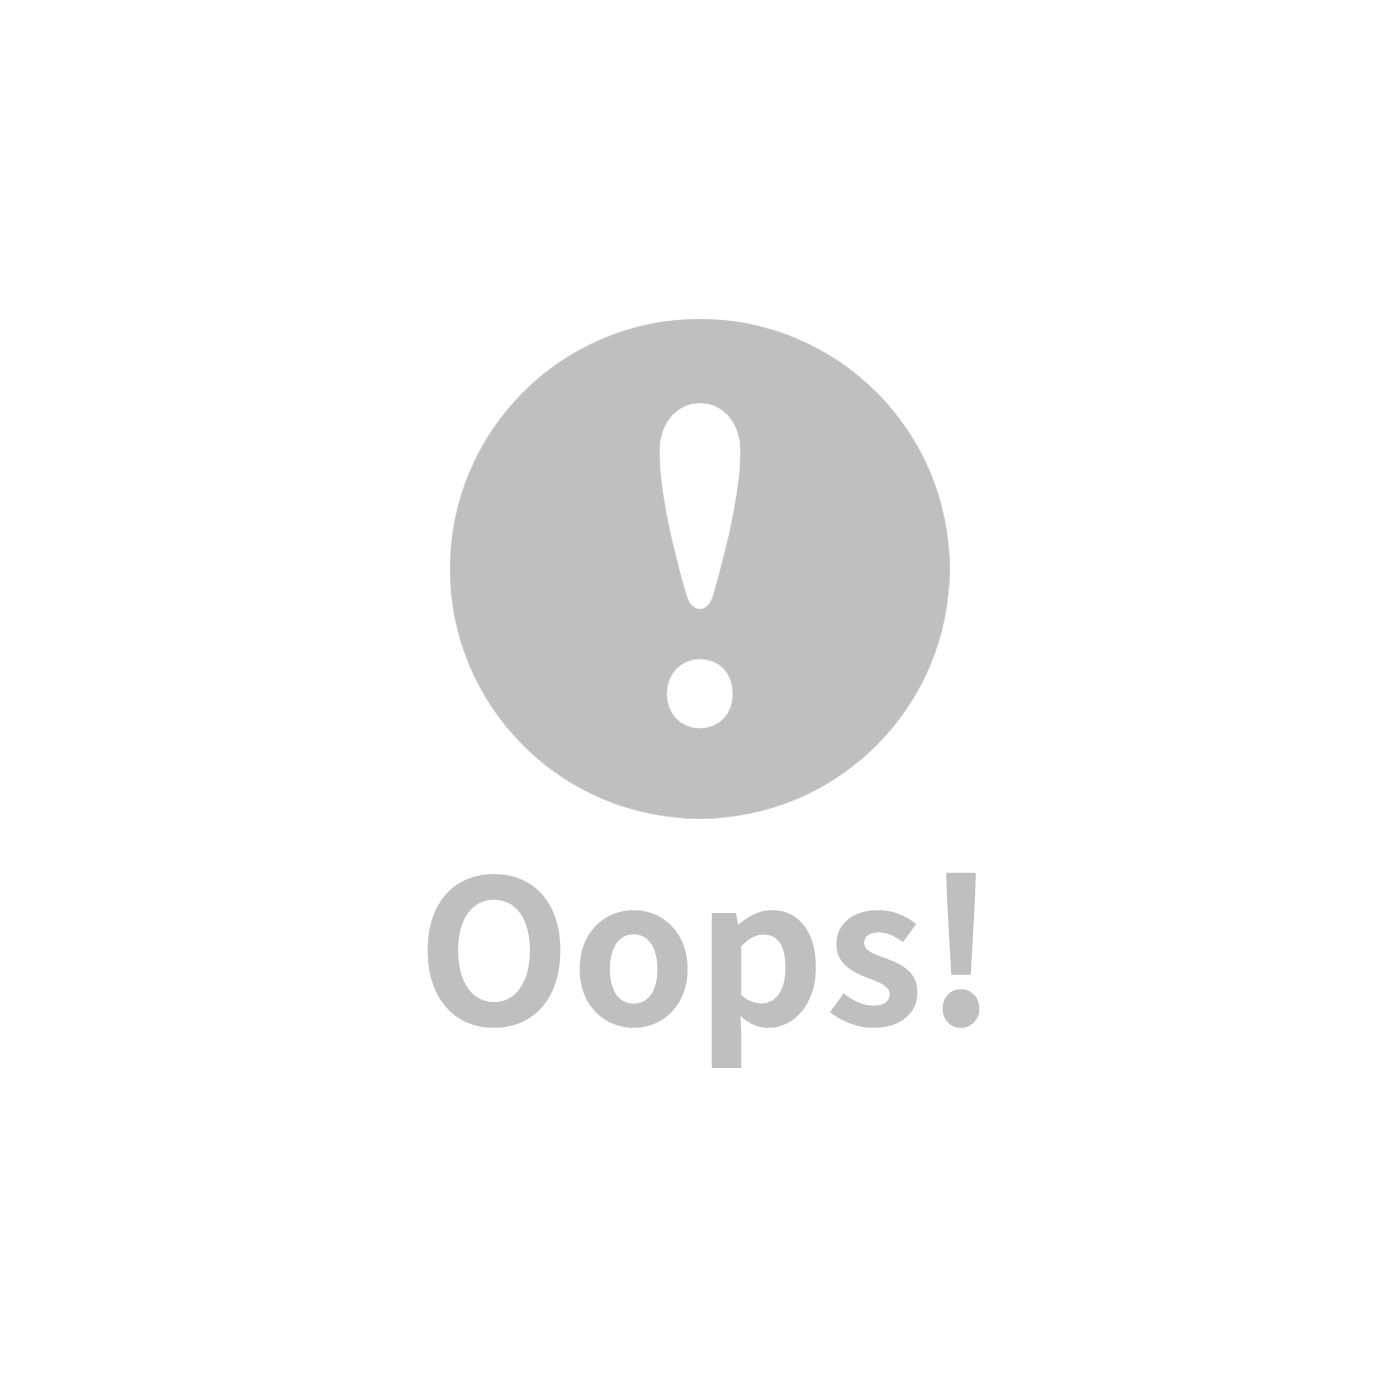 La Millou Moonies頂級羊皮膠底學步鞋禮盒11-18m_魔鬼氈款(沙士)